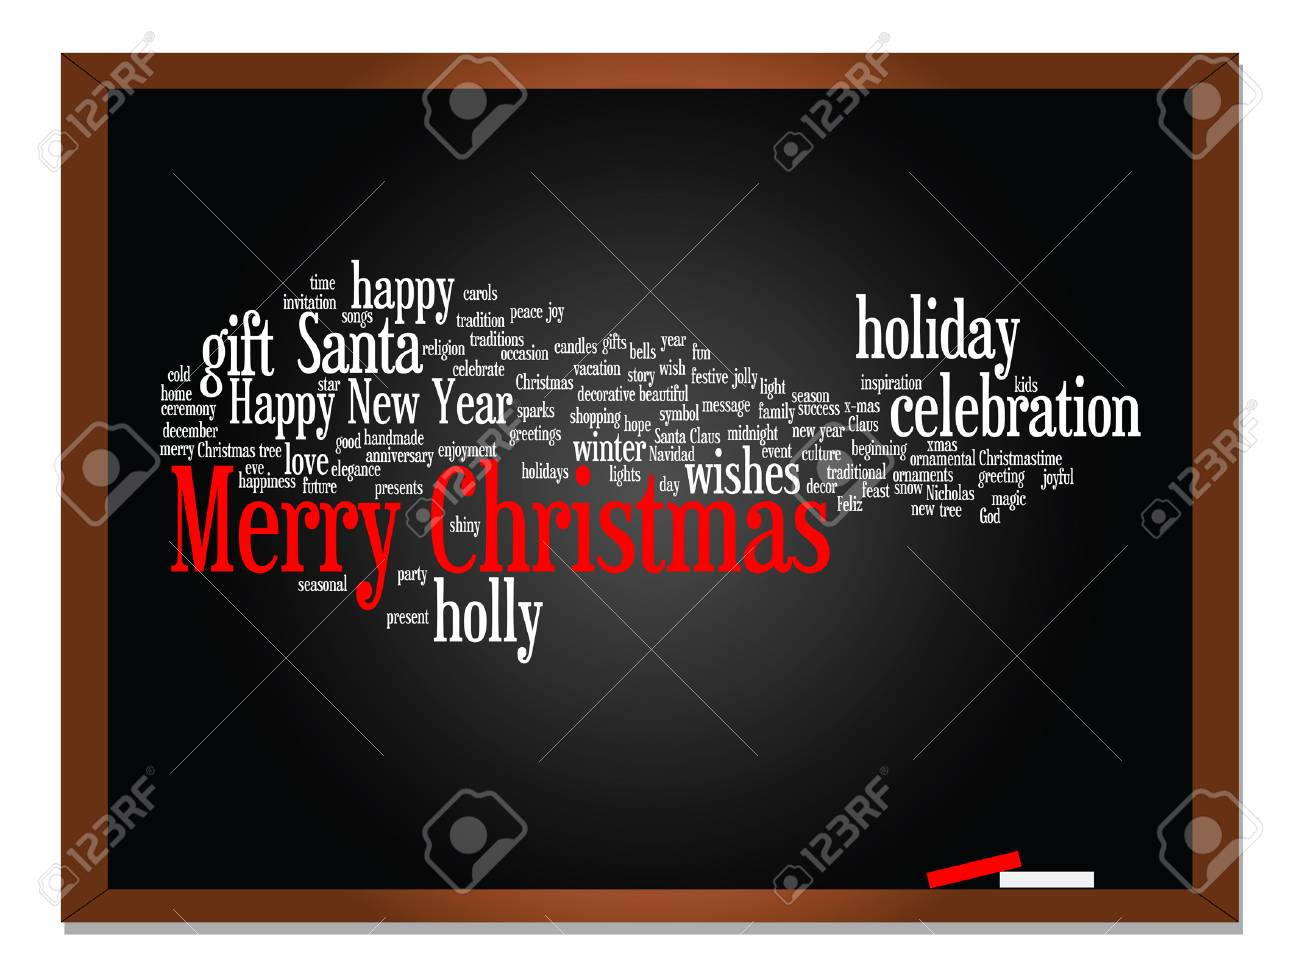 Buon Natale Del C Testo.Vector La Nuvola Concettuale Di Parola Del Testo Di Buon Natale Di